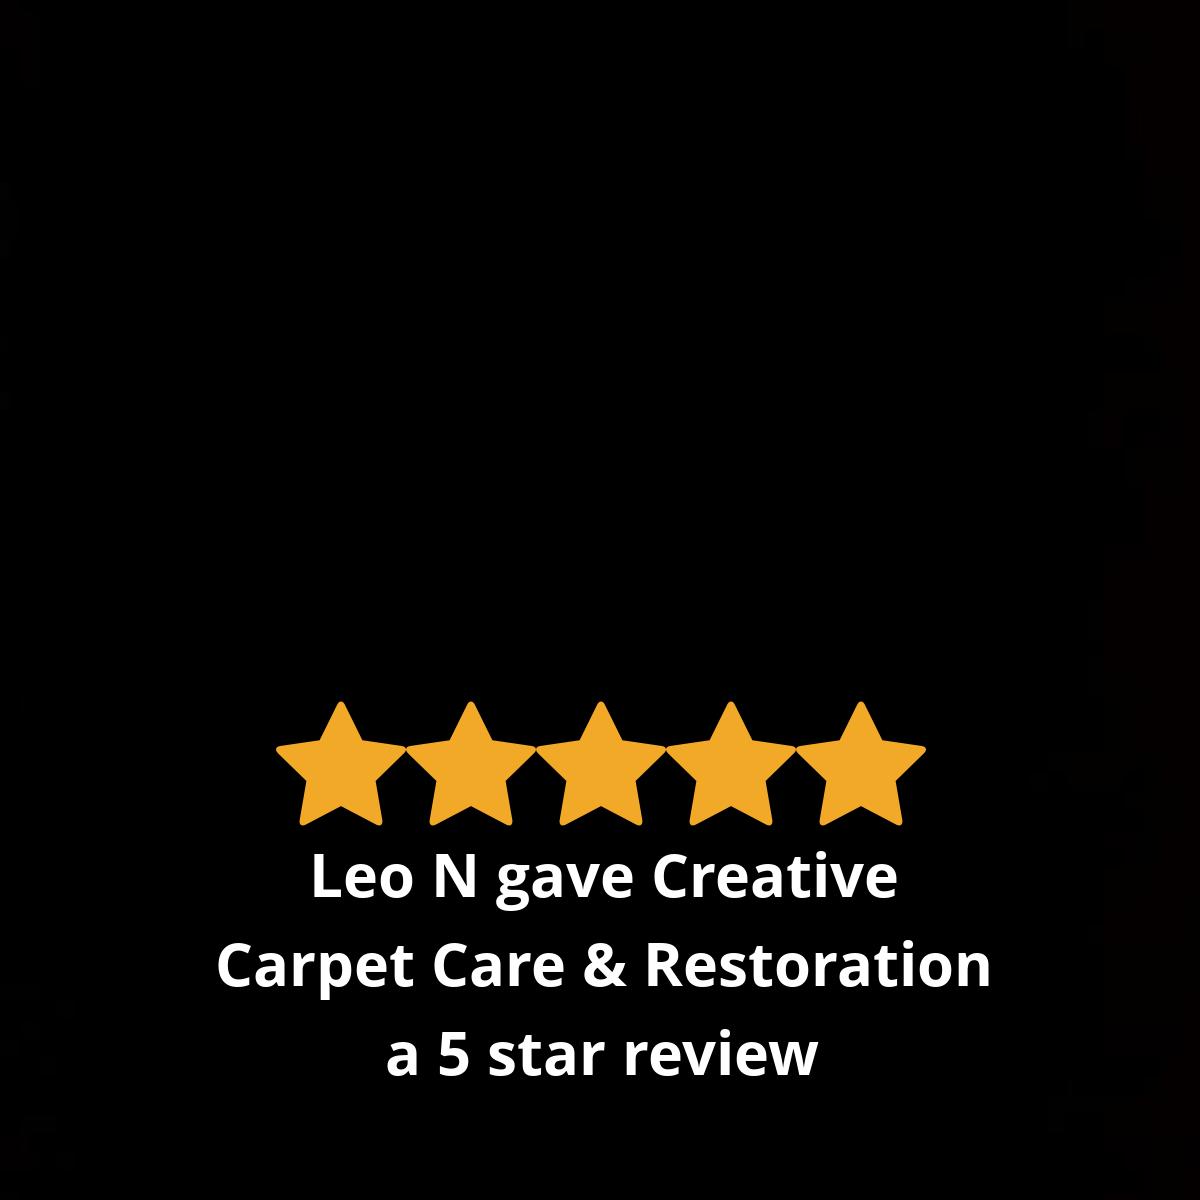 Leo N Gave Creative Carpet Care Restoration 5 Out Of 5 Stars Carpet Care Business Photos Restoration